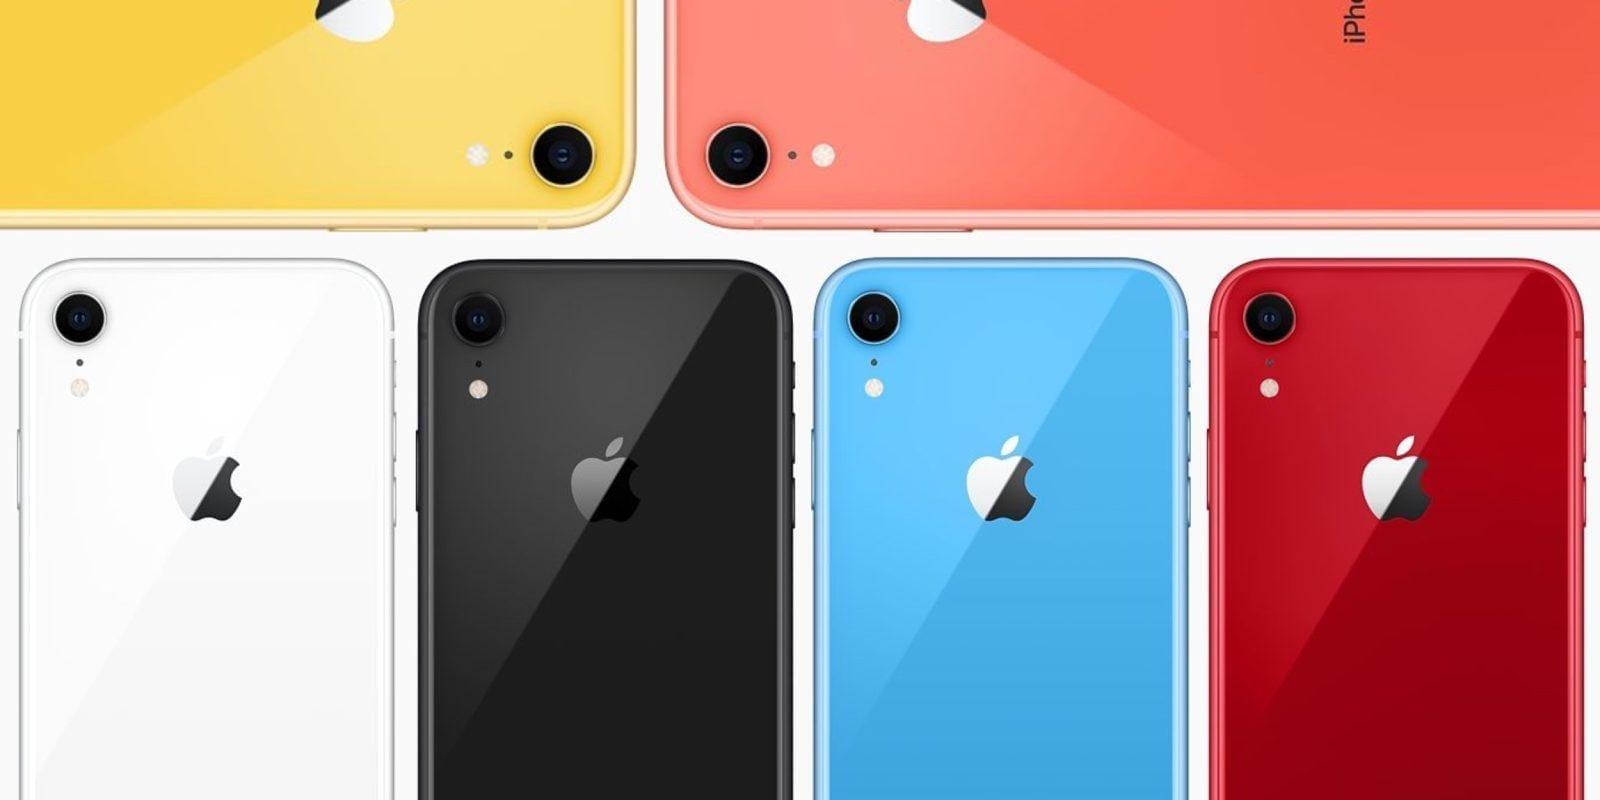 Apple iPhone XR 2 получит двойную камеру (iphone xr colors)